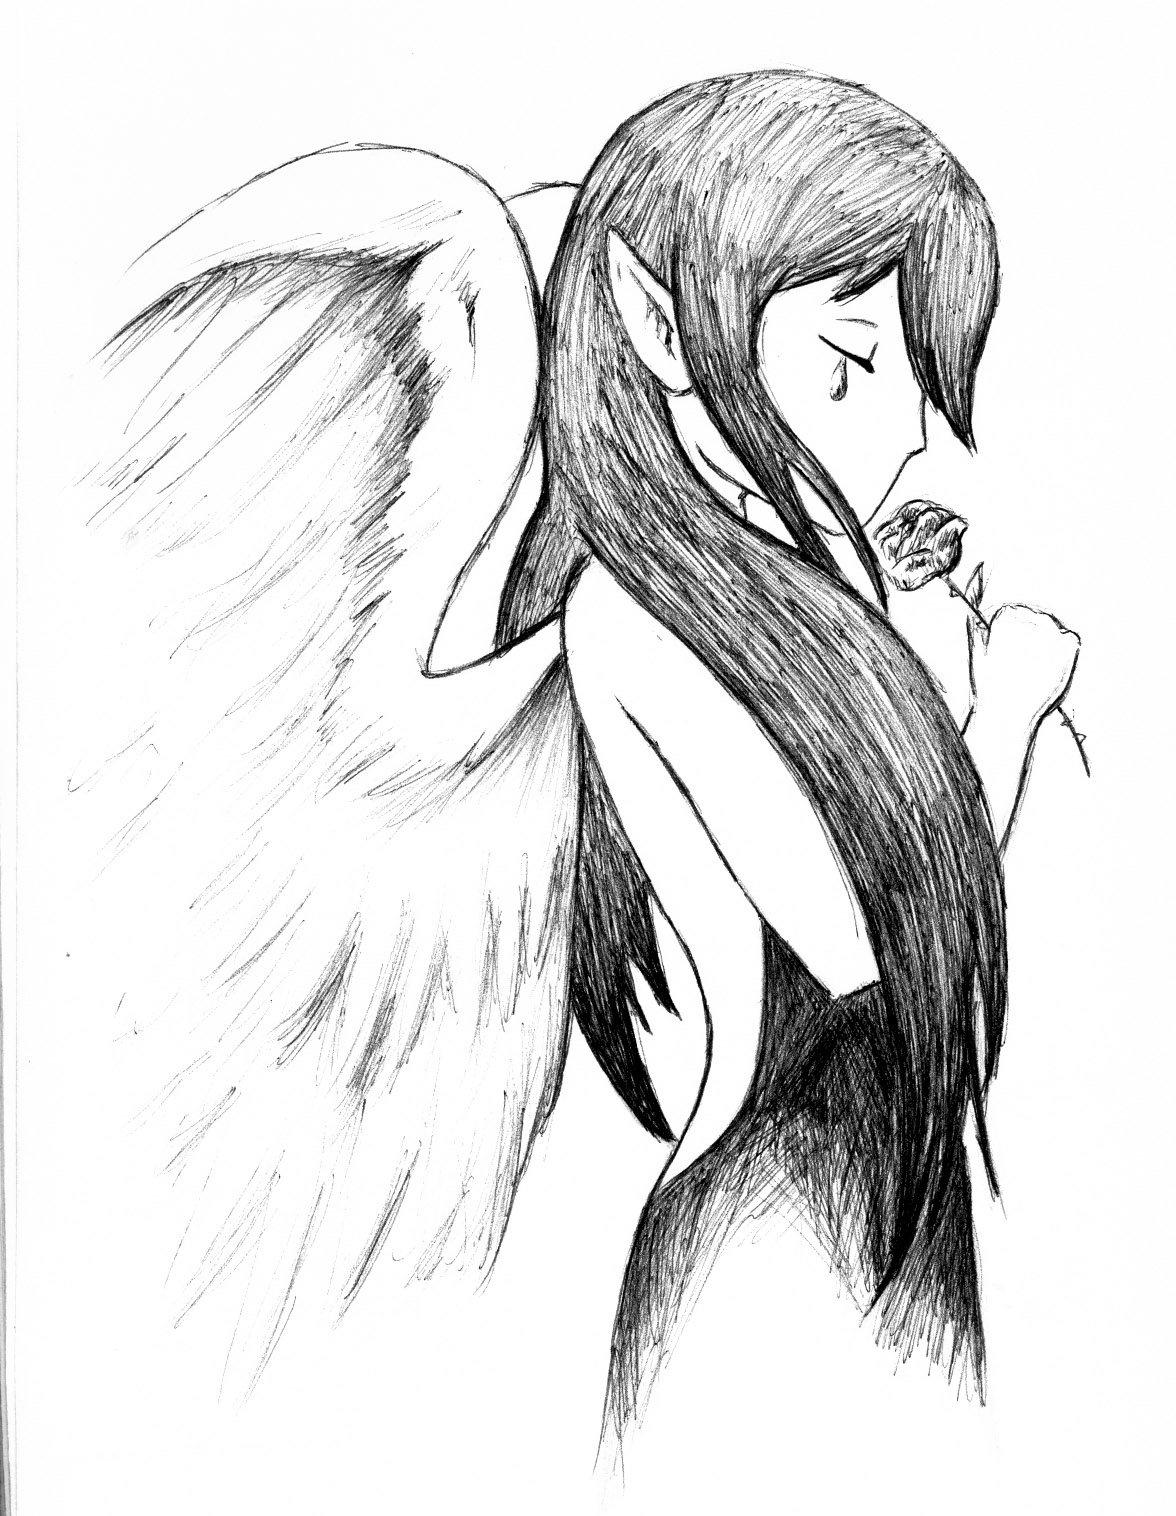 1176x1516 Sad Angel Anime Drawings Pencil Sad Angel Anime Drawings